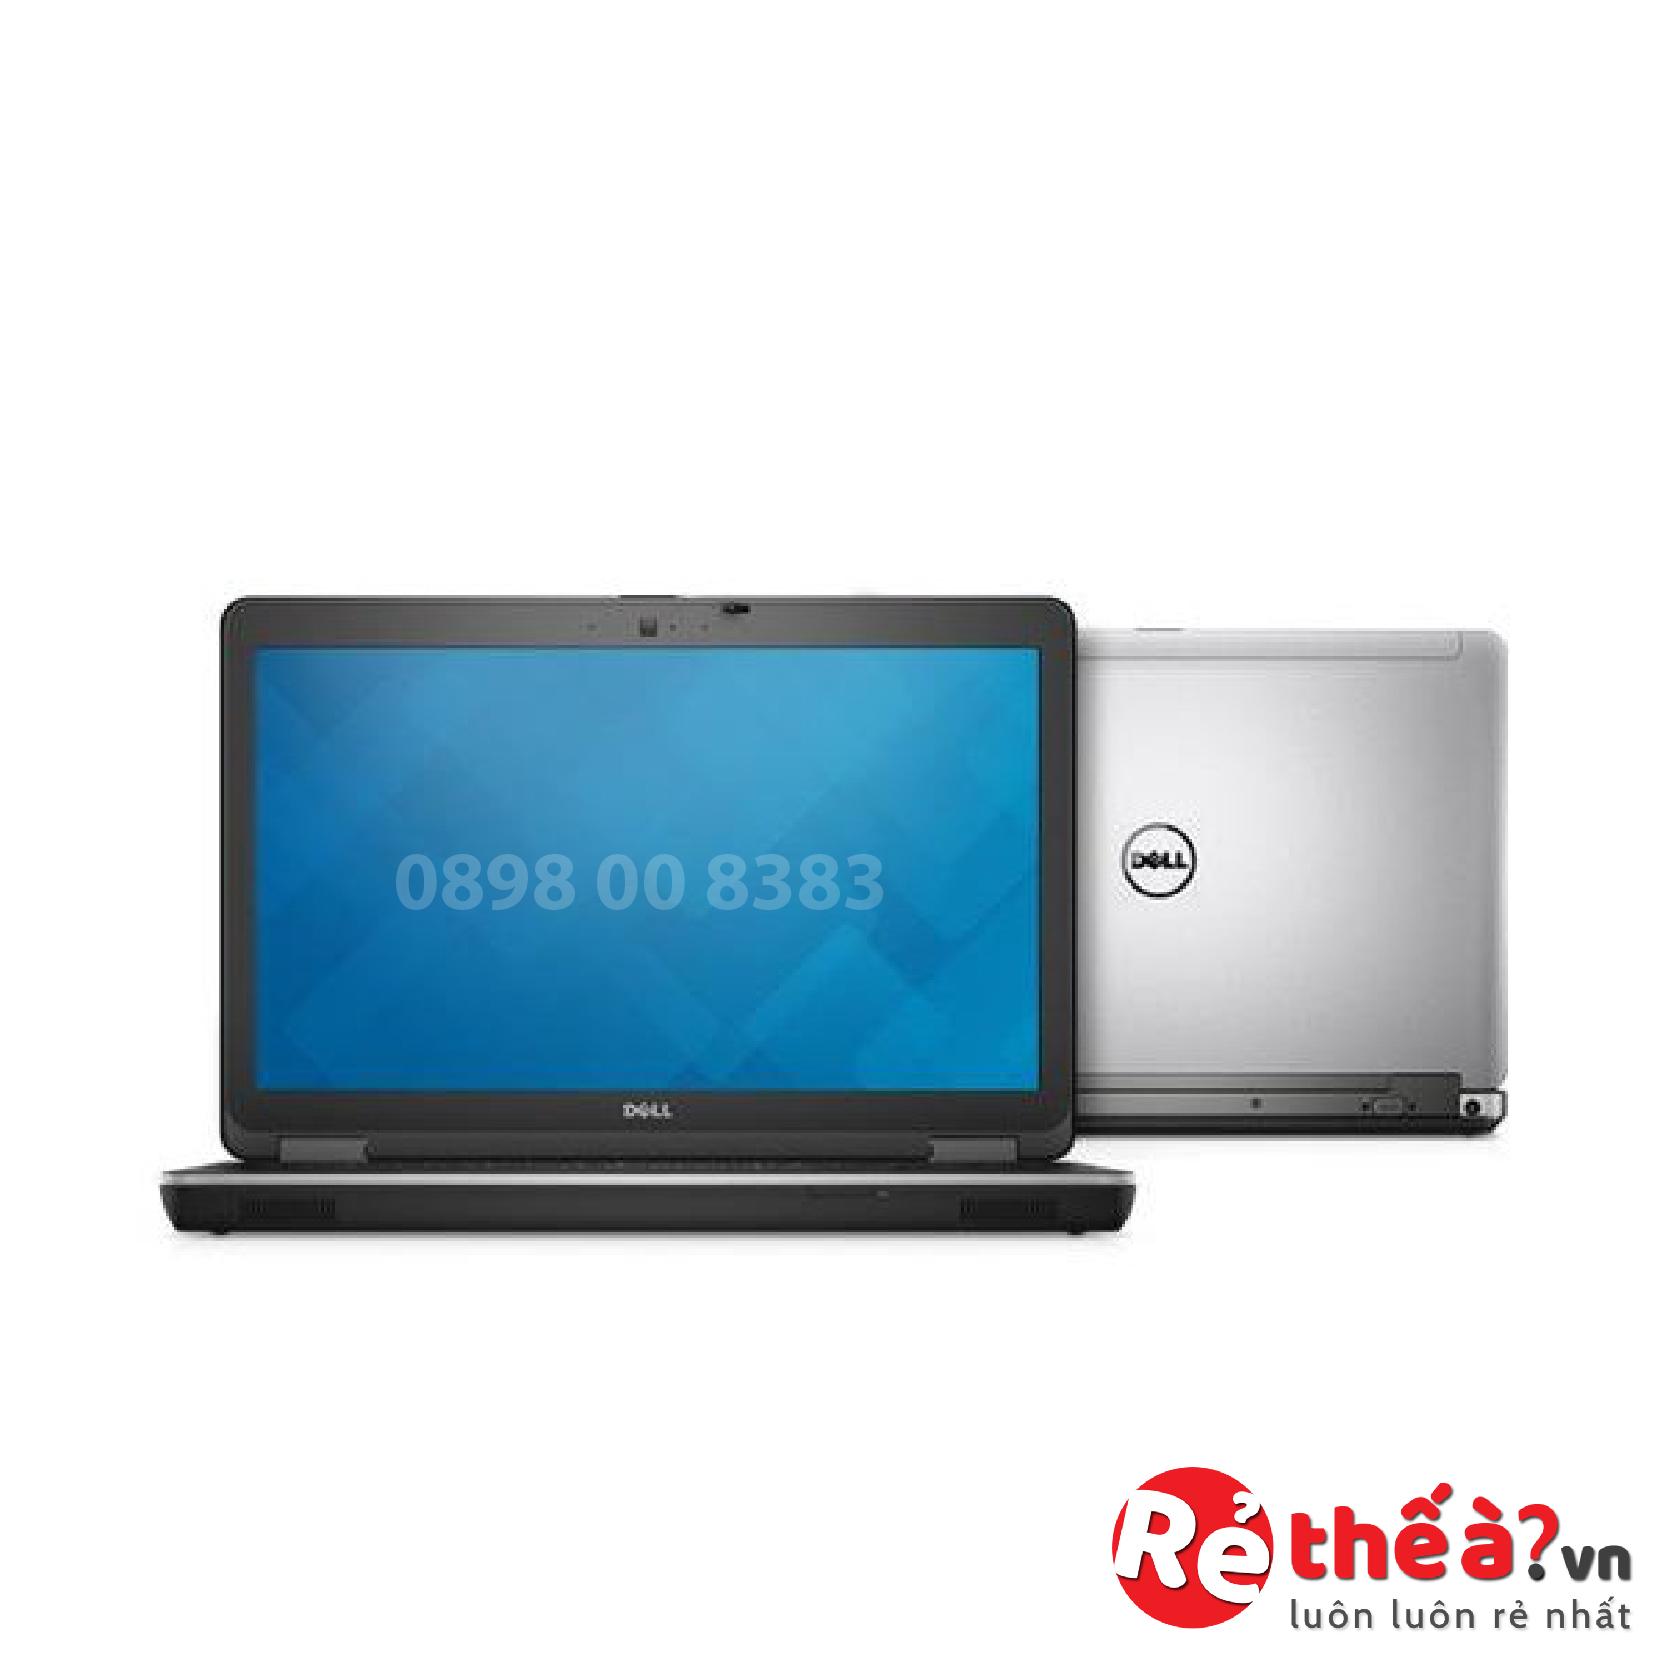 Laptop Dell Latitude E6540 VGA rời